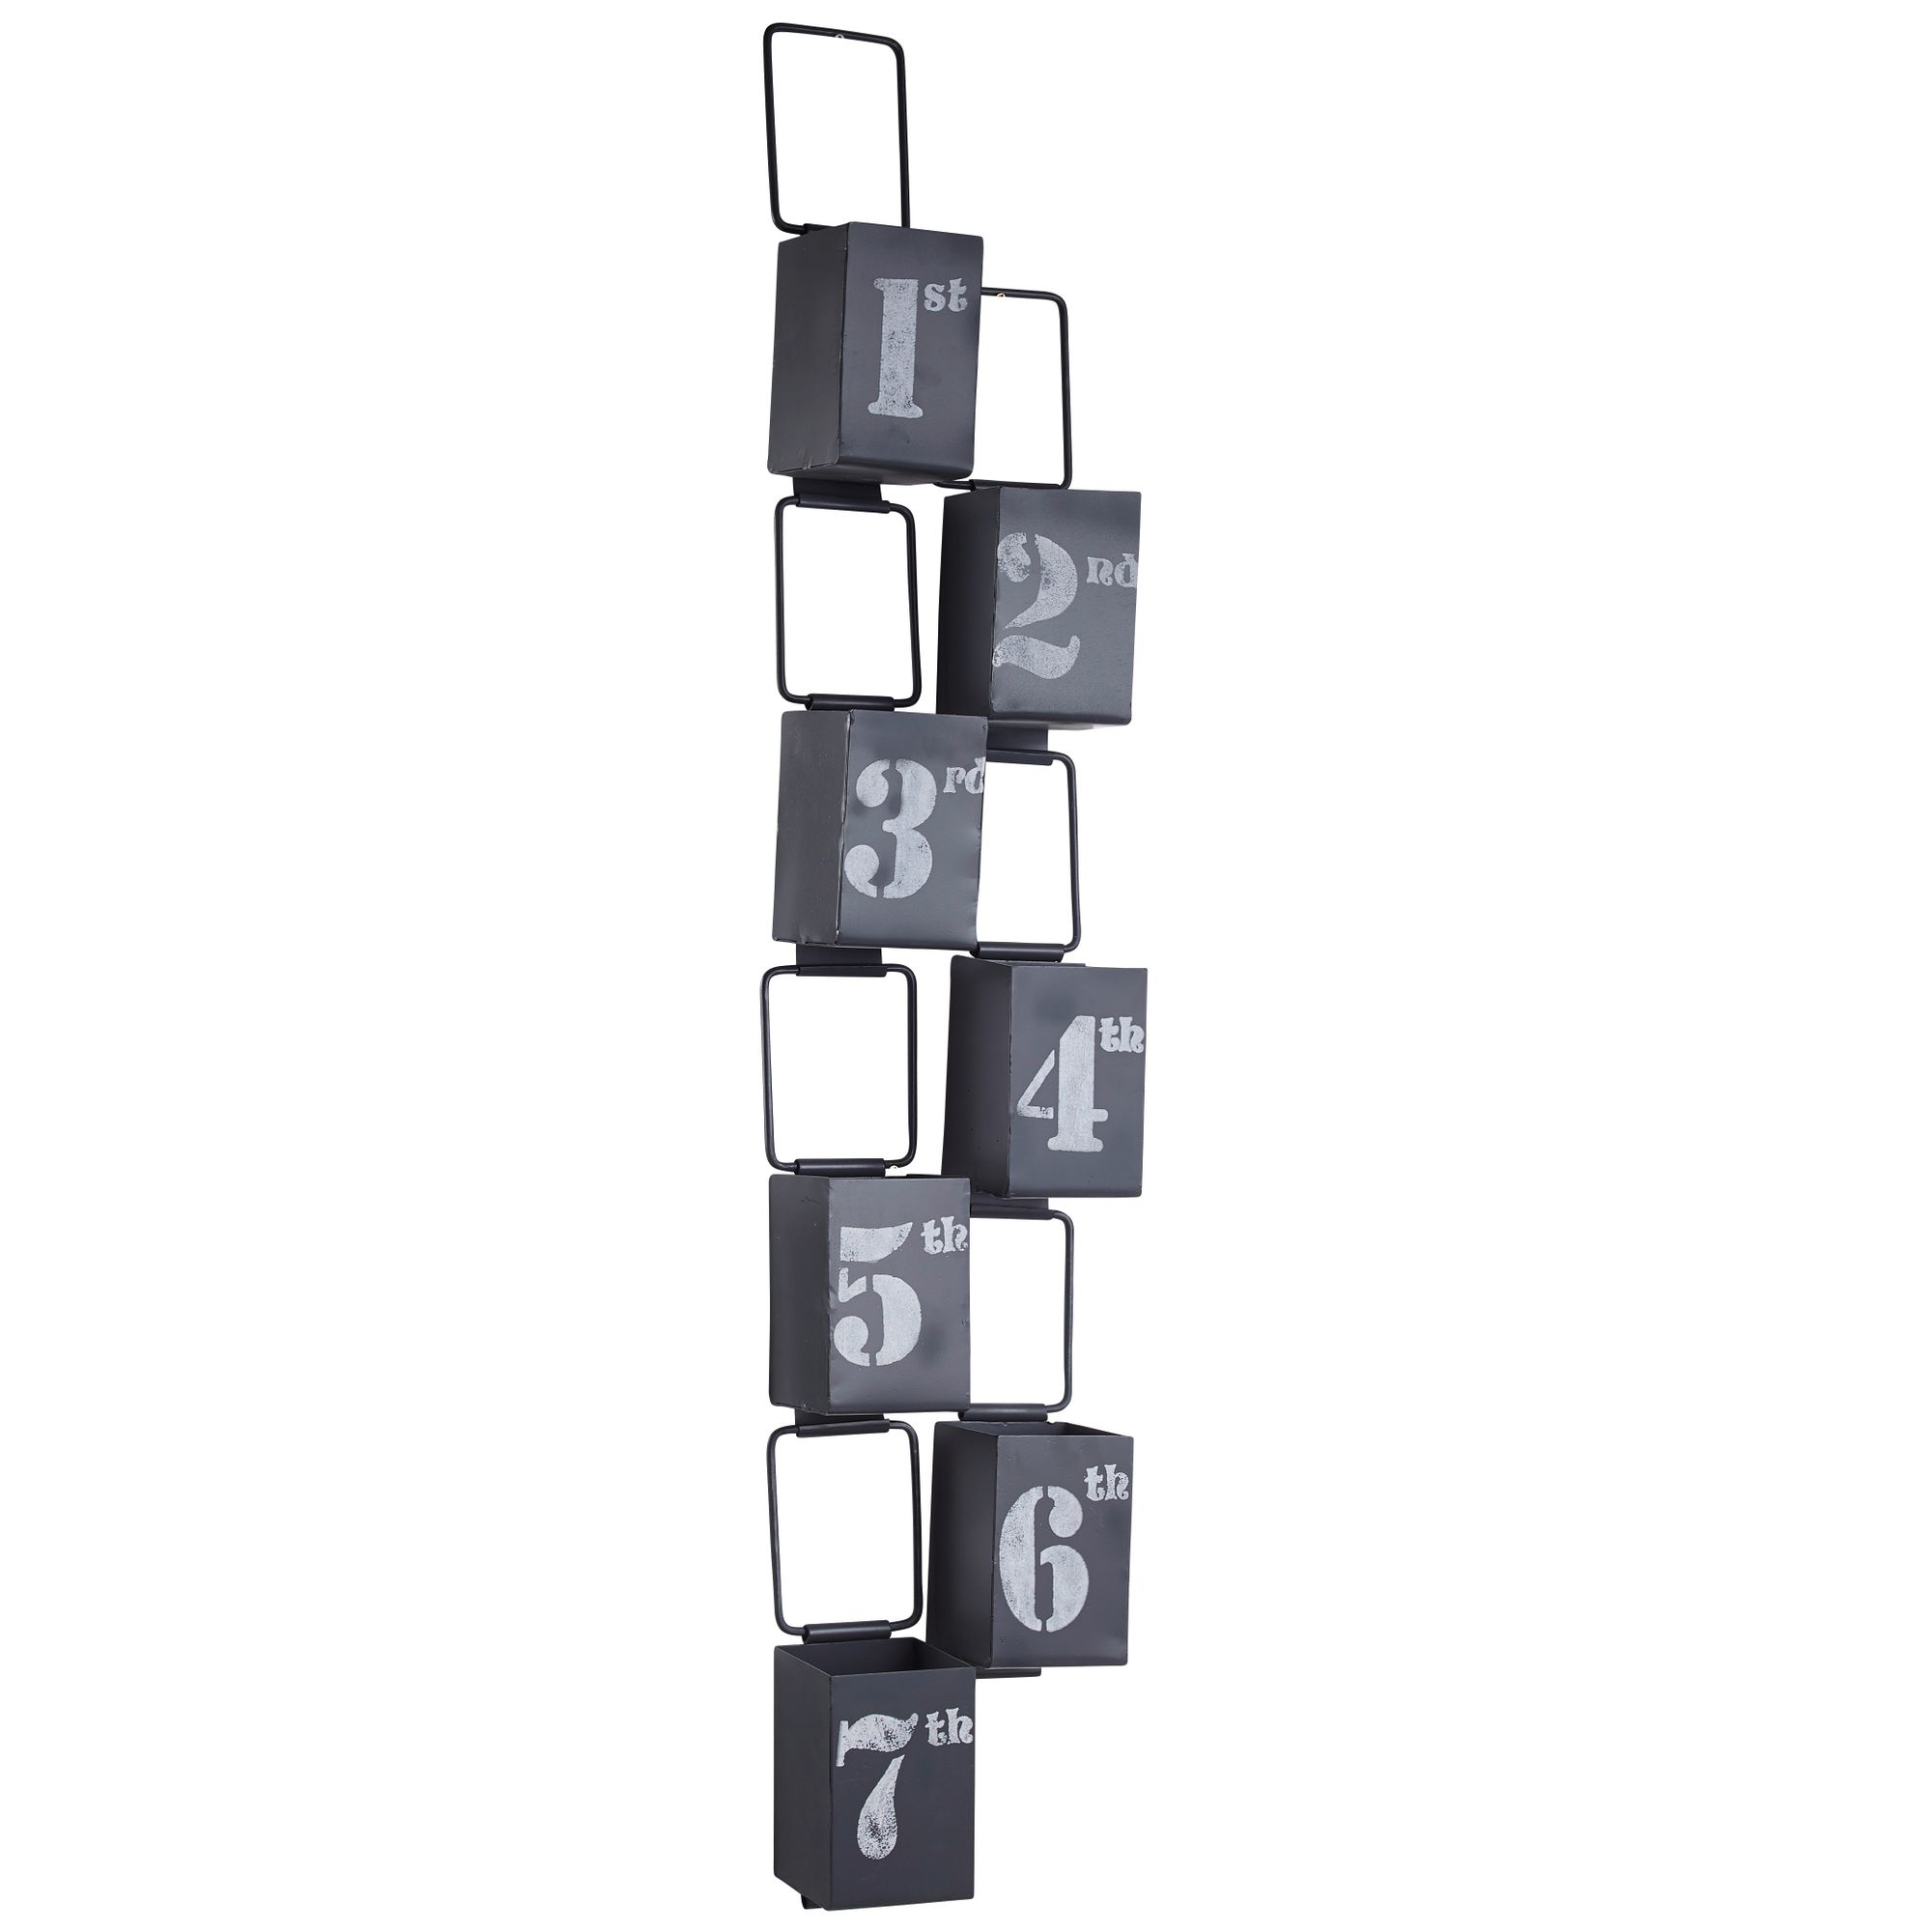 Full Size of Regale Metall Stecksystem Obi Regal Schwarz Mit Holz Gebraucht Wand Industrial Toom Schmal Ikea 5c70b9f95e2eb Meta Nach Maß Selber Bauen Dvd Cd Für Keller Regal Regale Metall